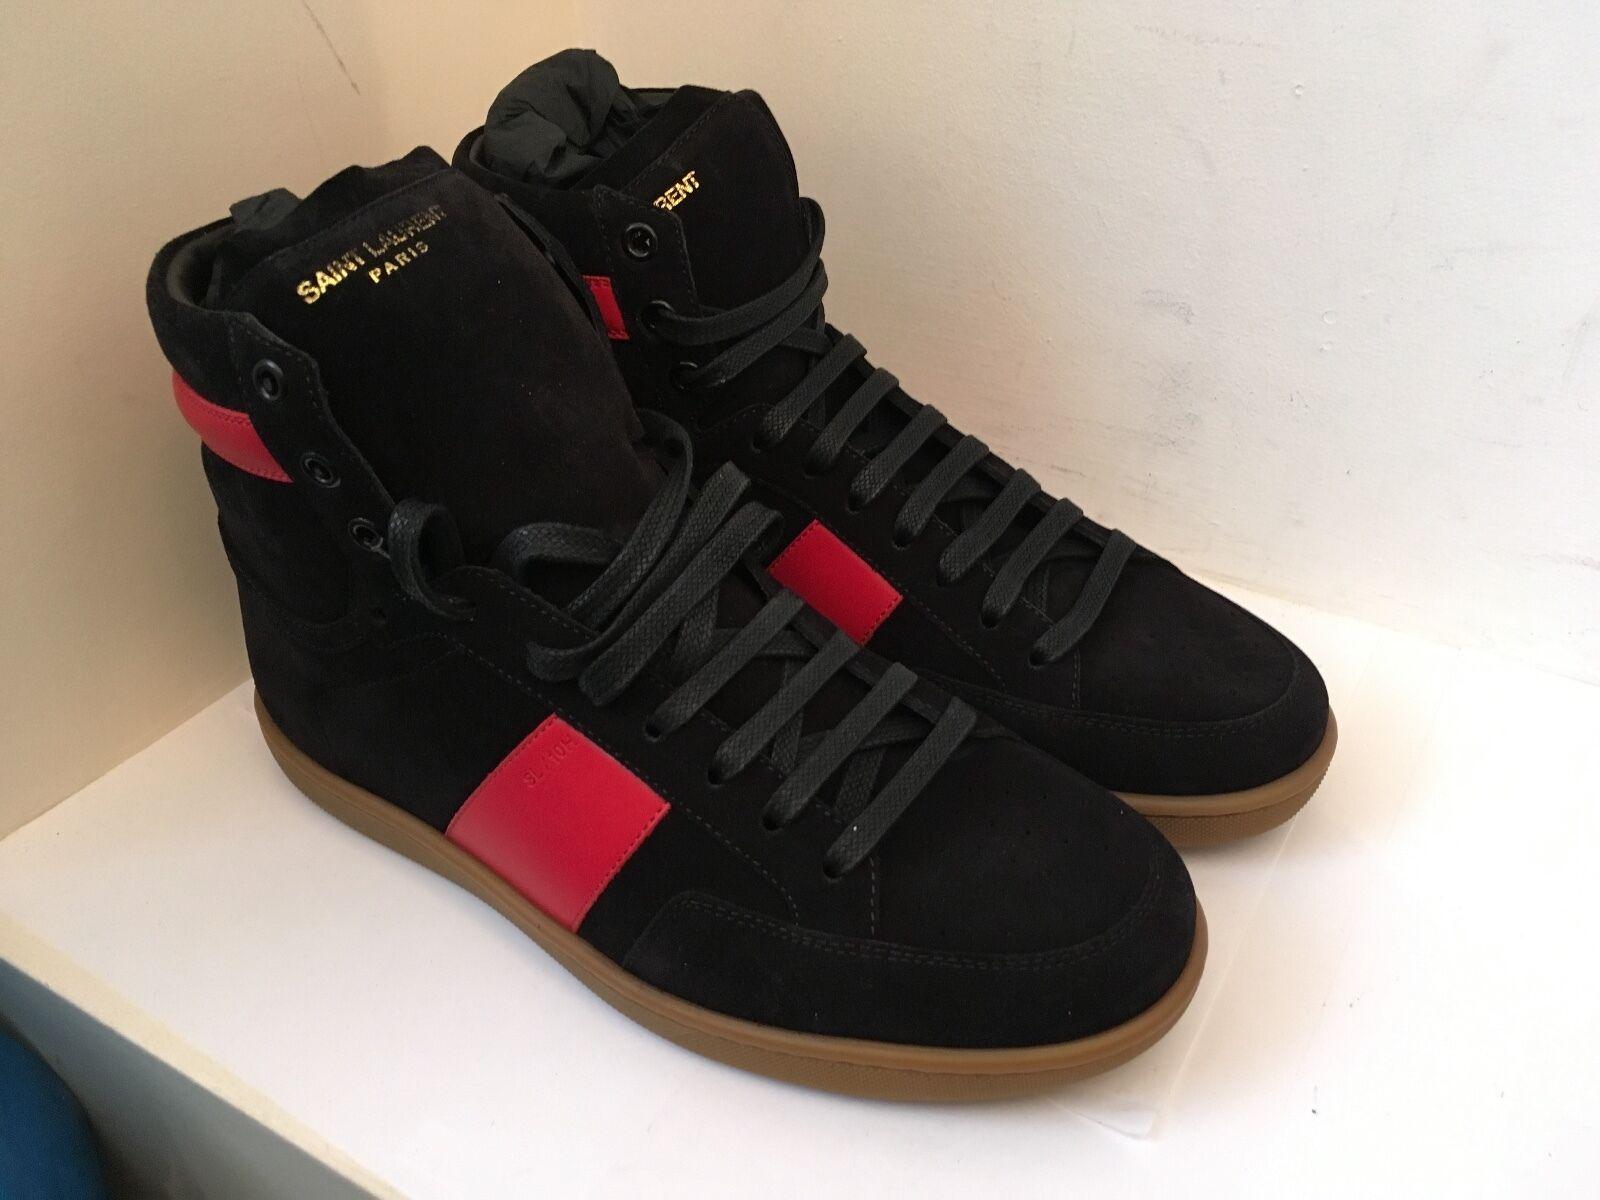 Saint Laurent Paris SL/10 Zapatillas.. (YSL, Gamuza, Js, Vandal, MJ, Lujo, De Colección)